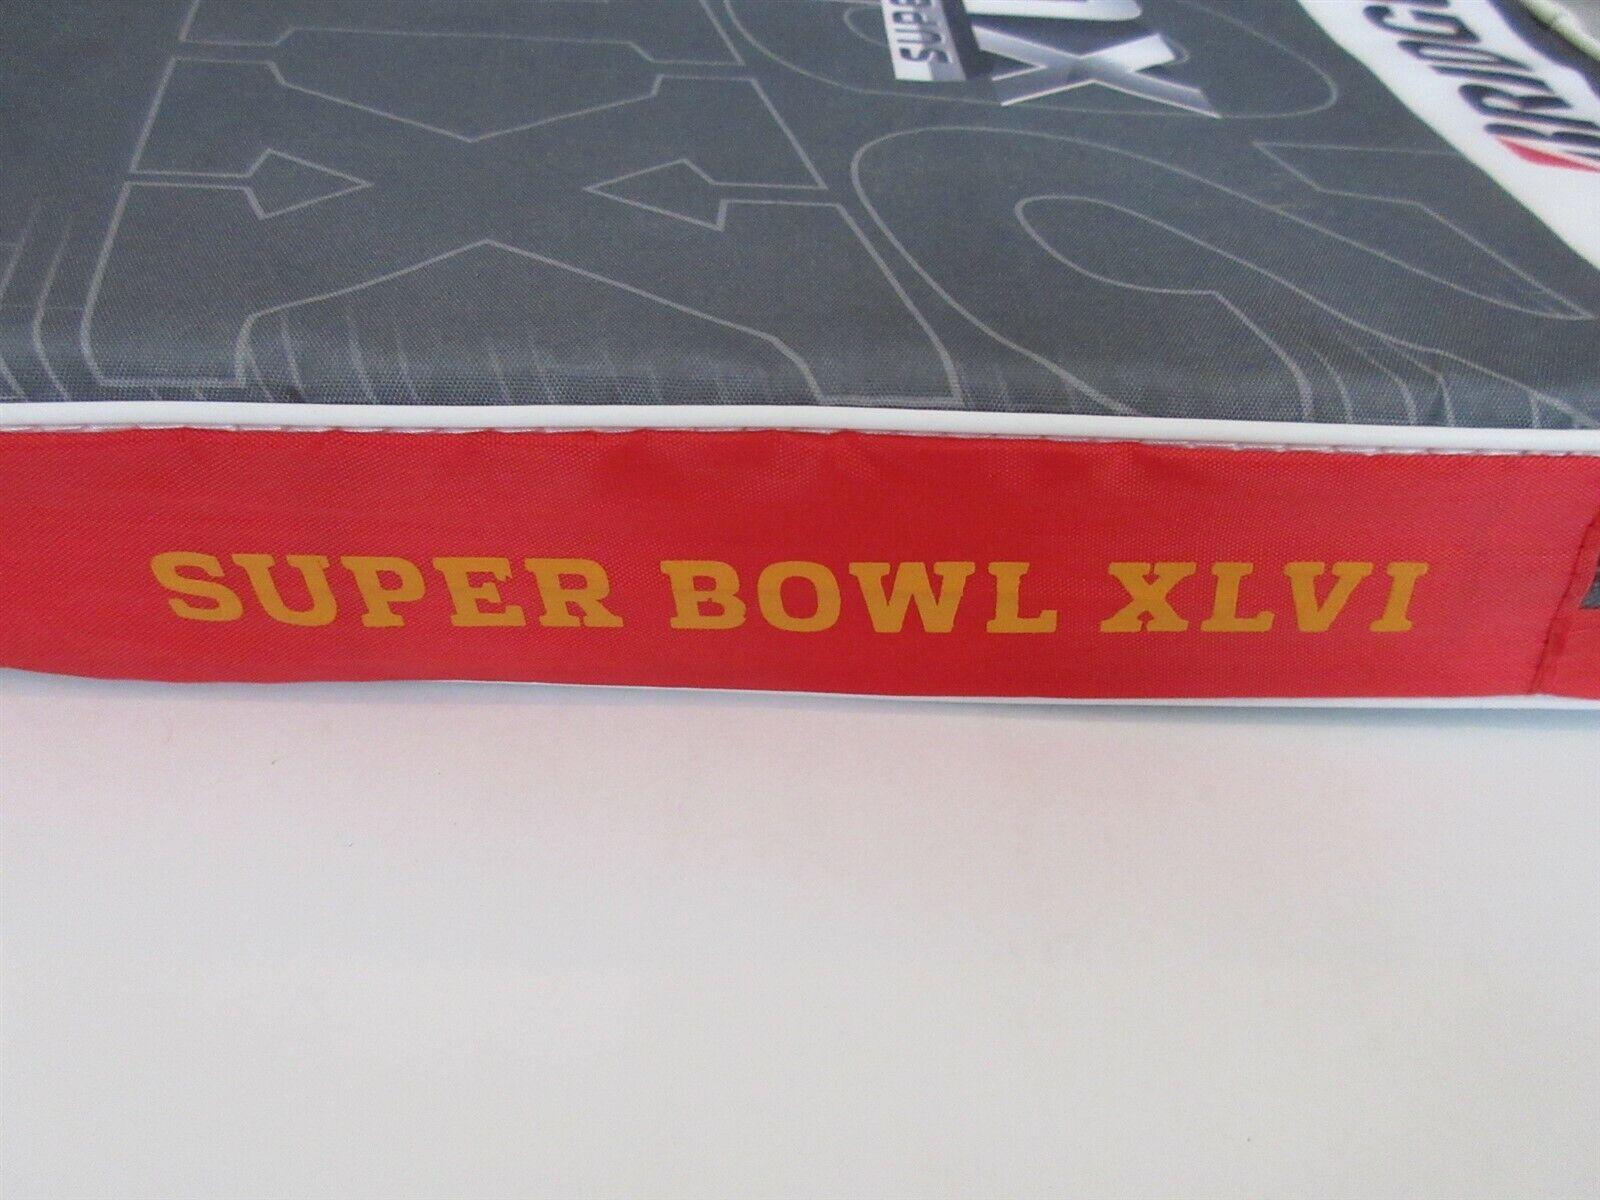 SUPER BOWL XLVI SEAT CUSHION SGA INDIANAPOLIS 2012 GIANTS MANNING NFL FOOTBALL - $24.99